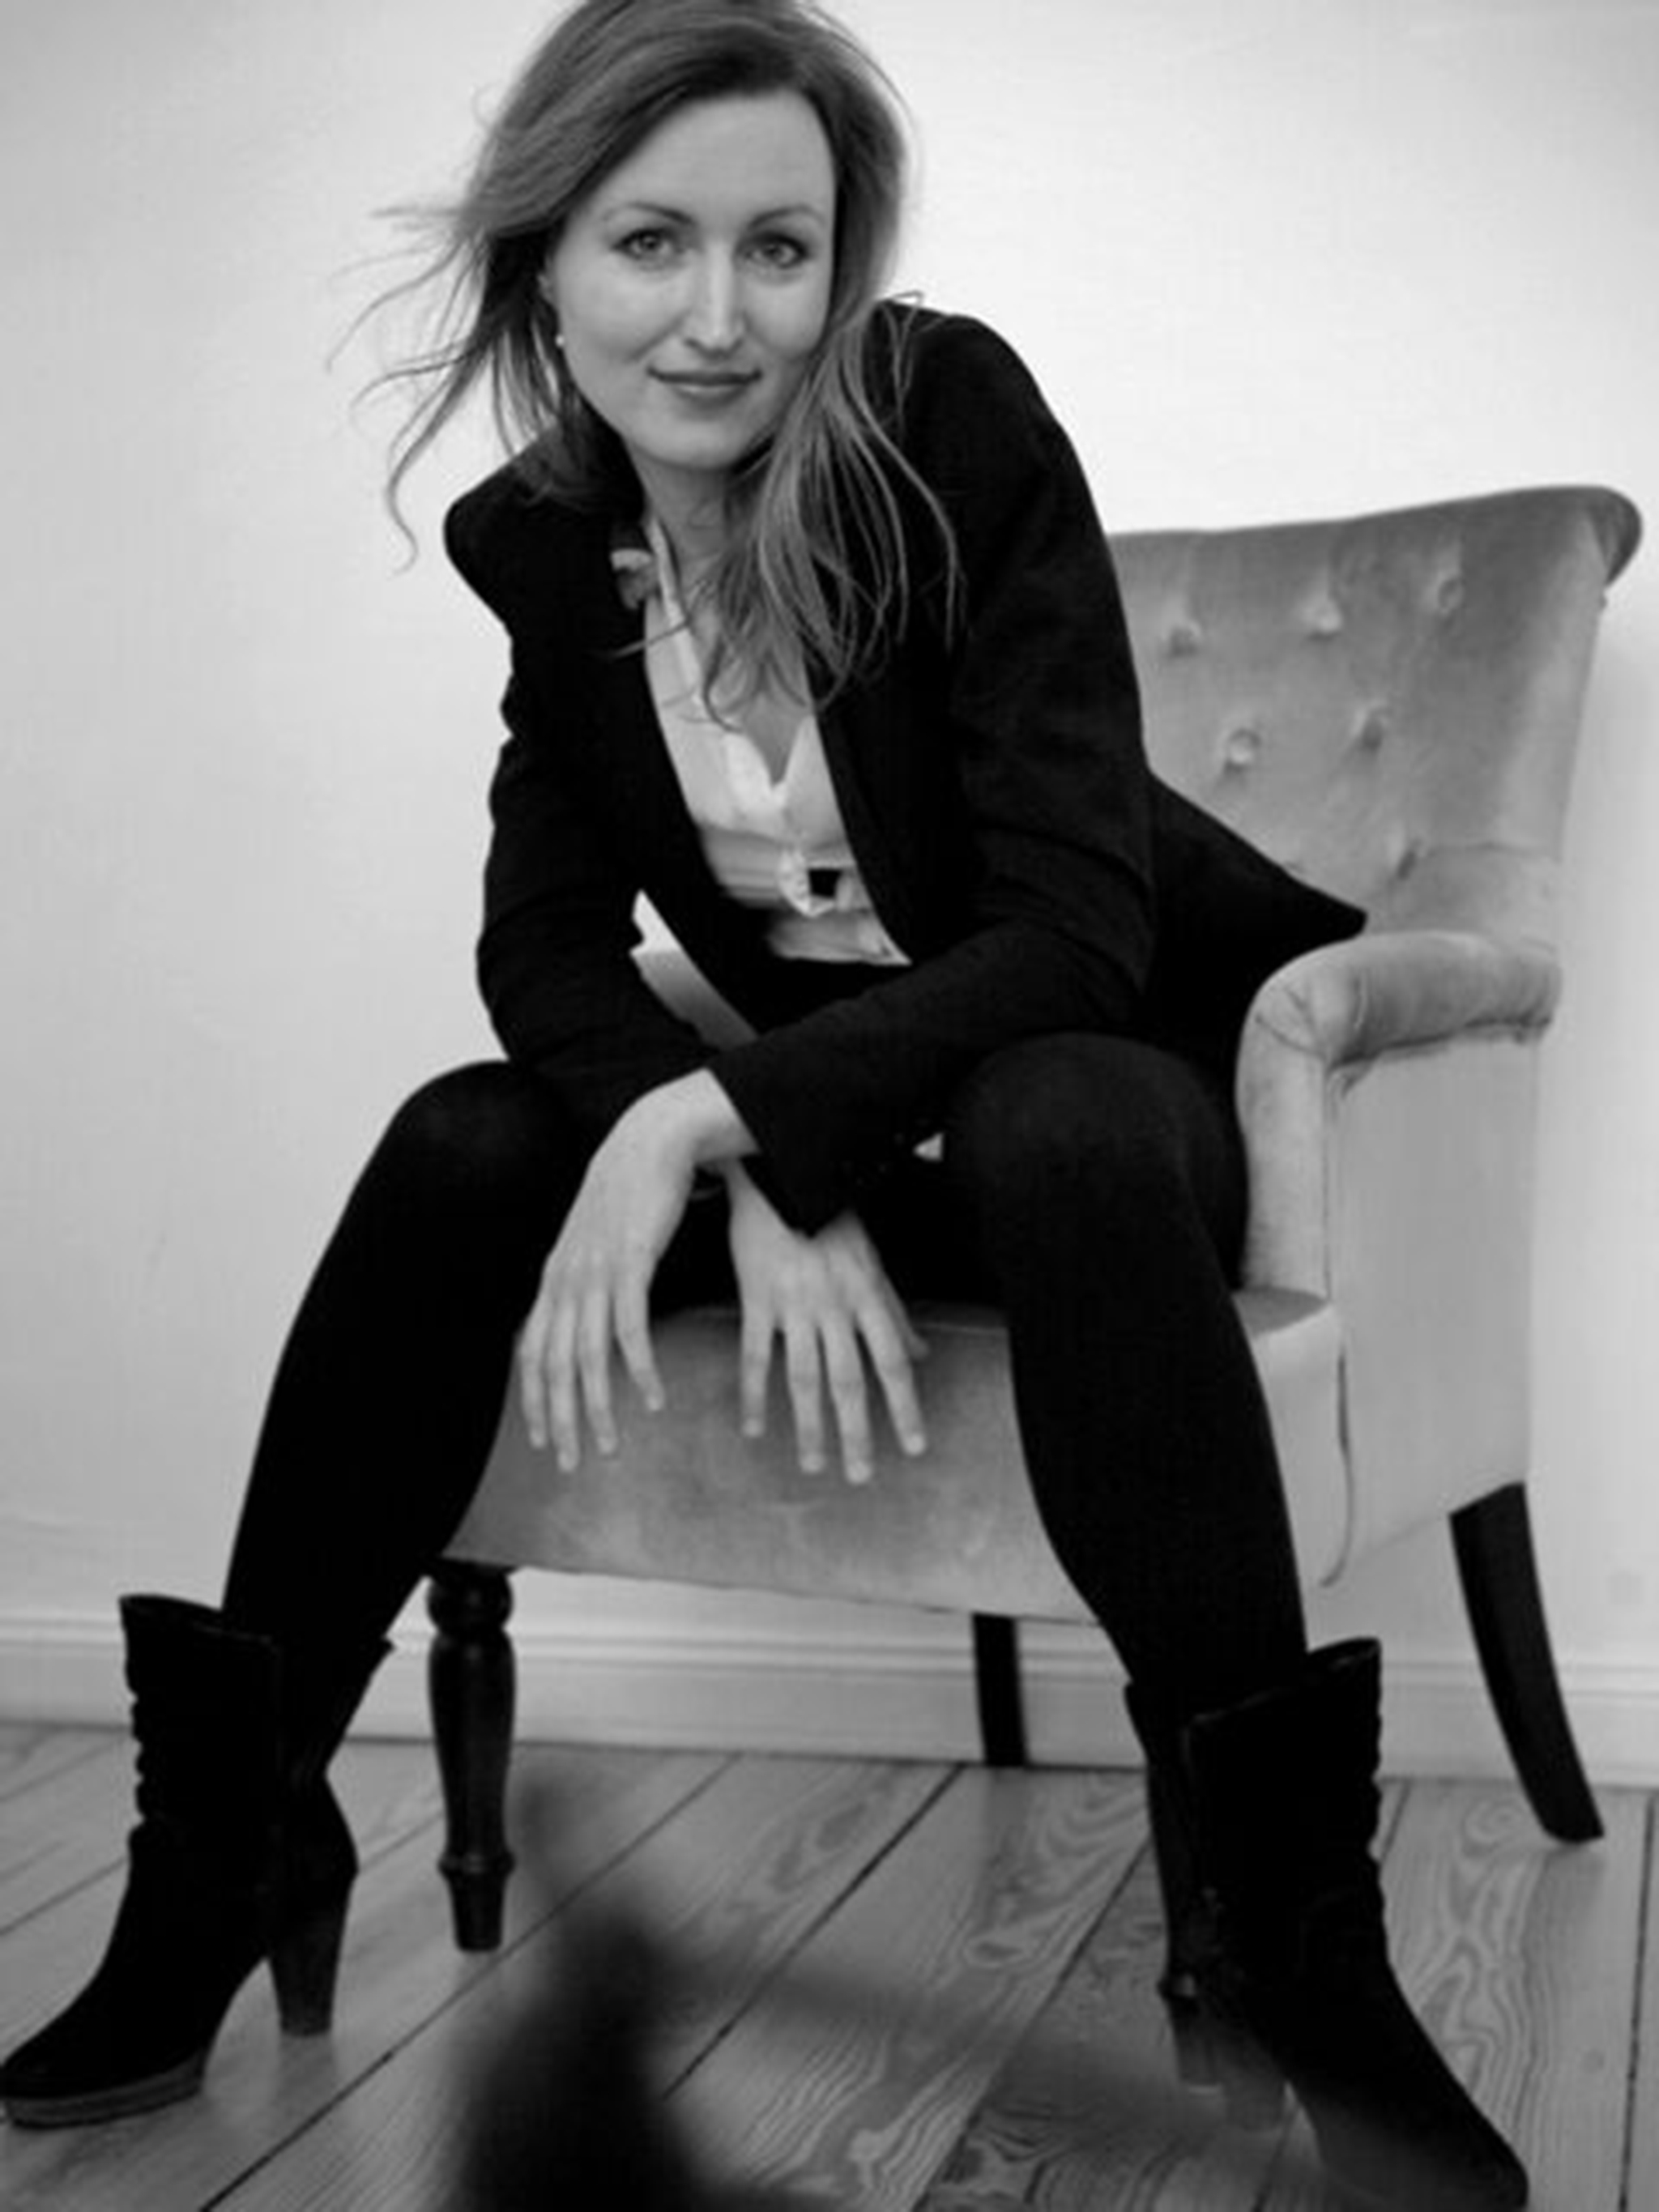 Yvonne Gesler